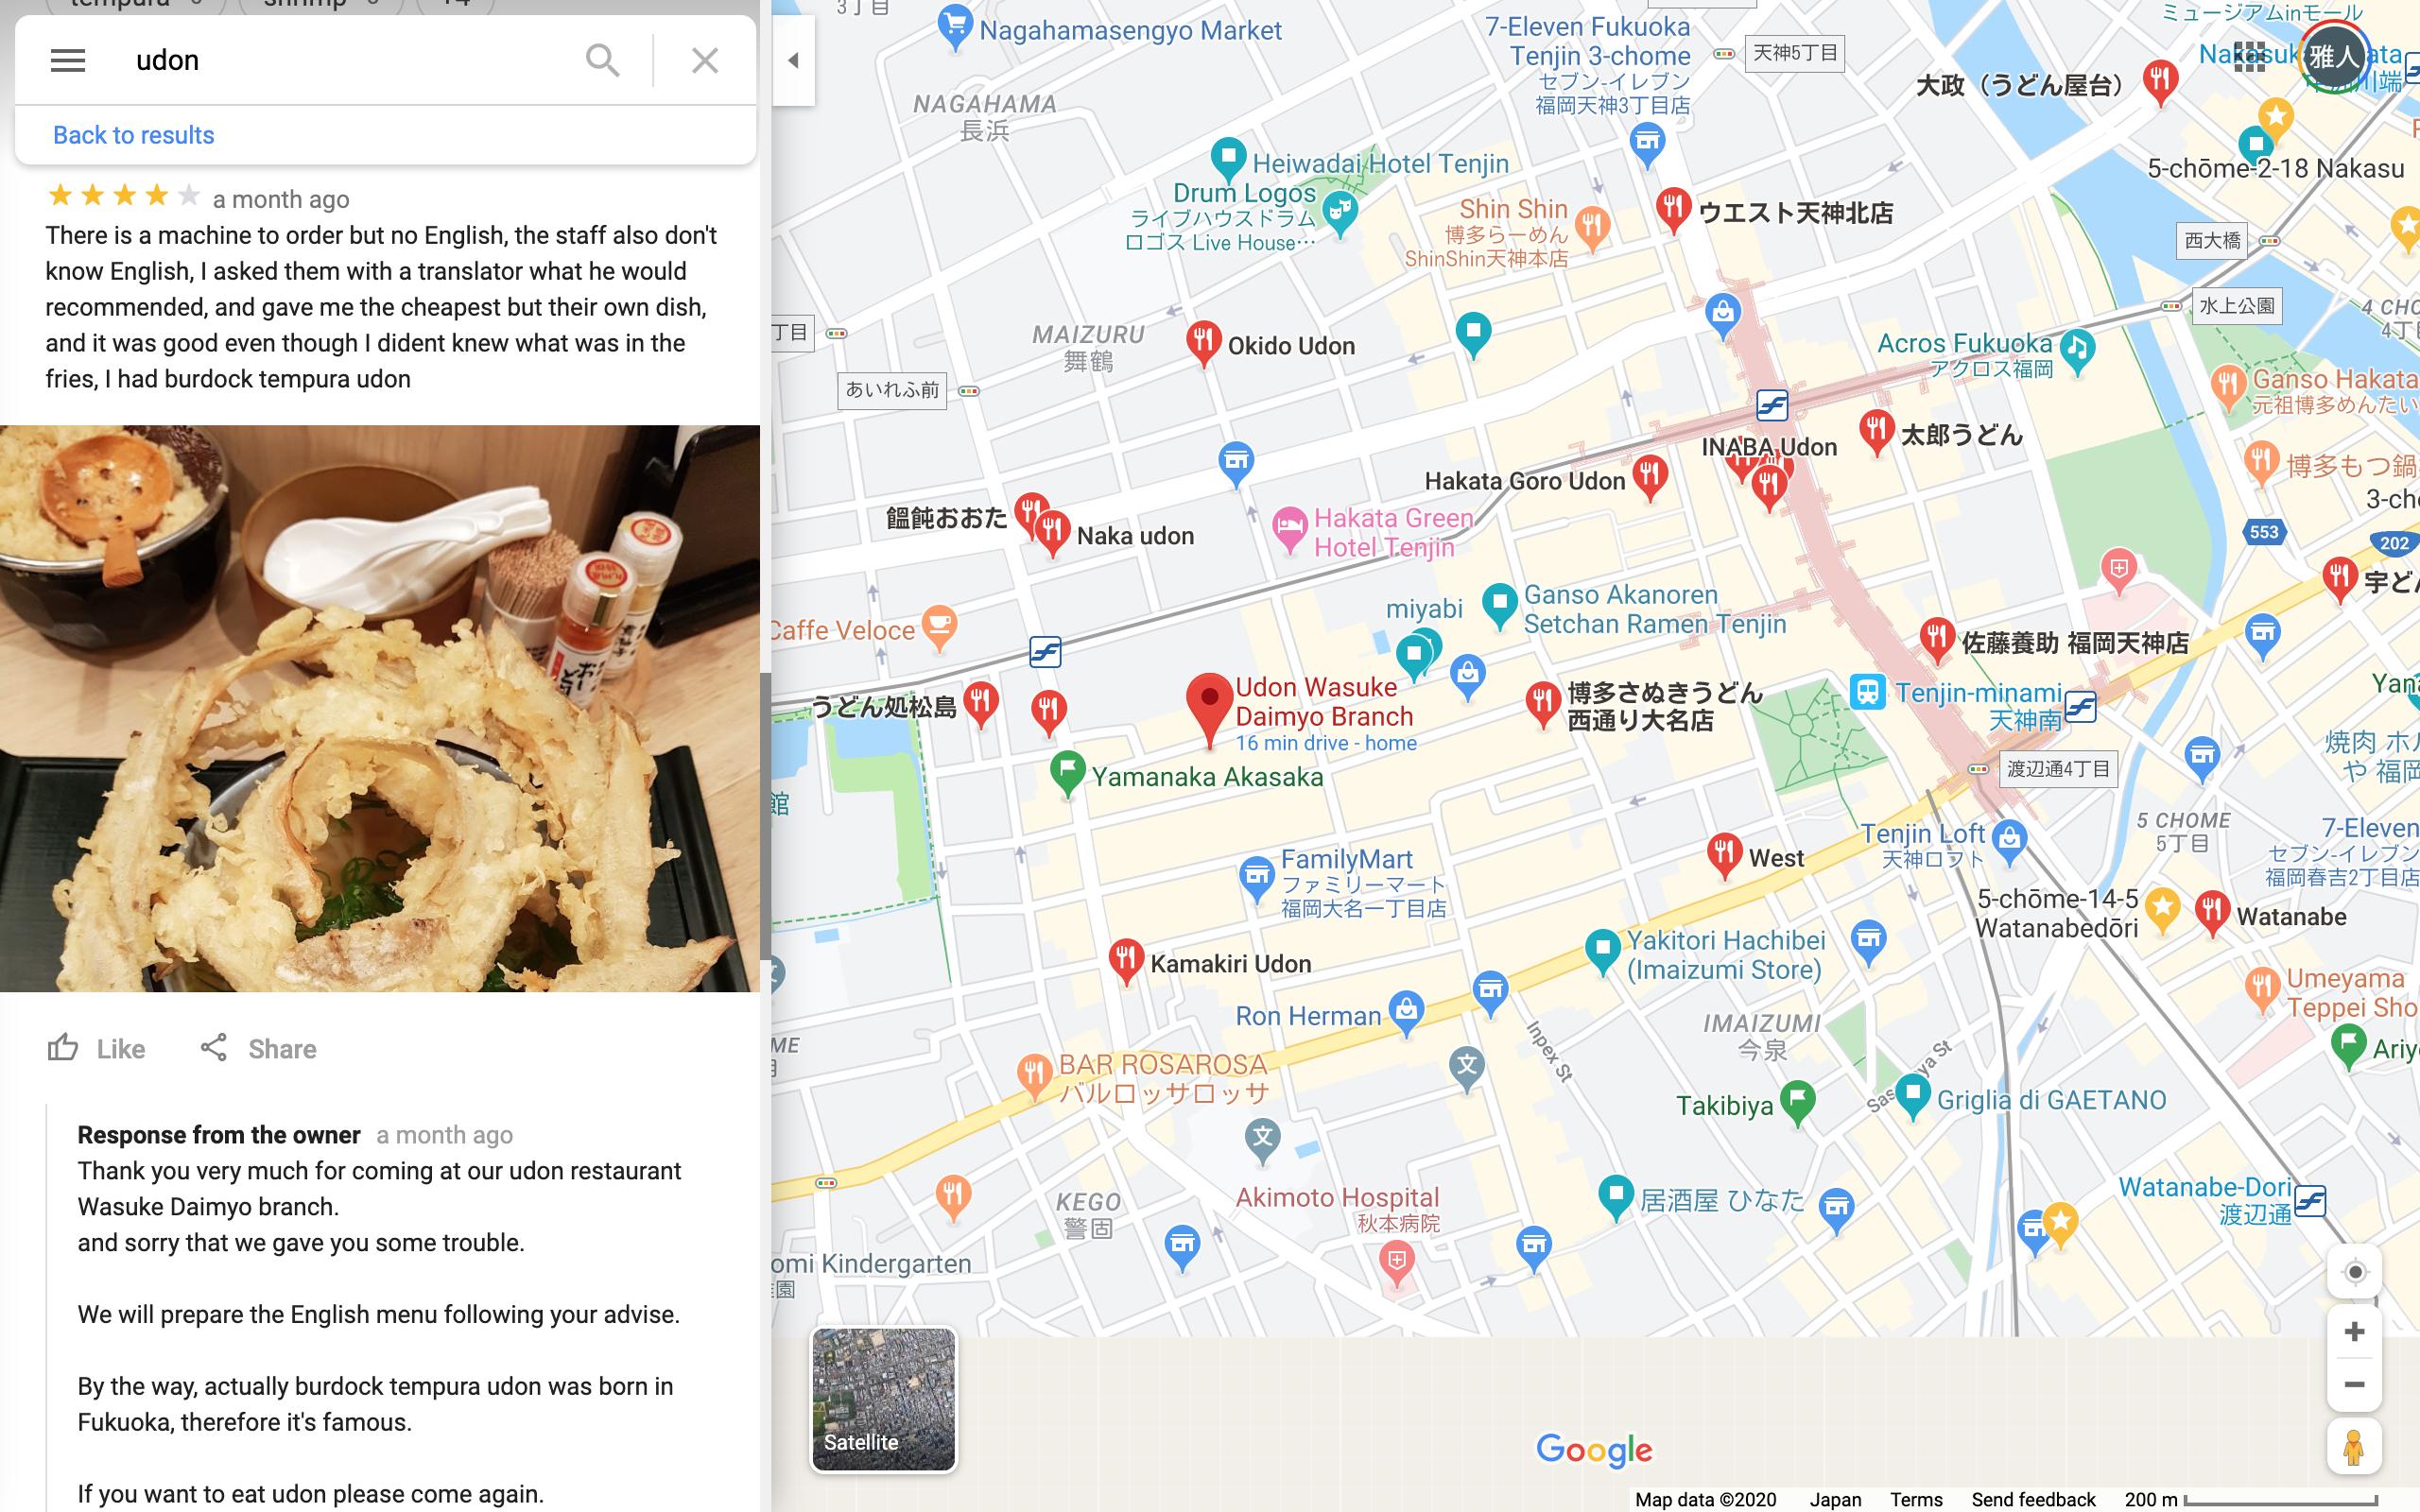 Google Map 多言語コメント返信 事例